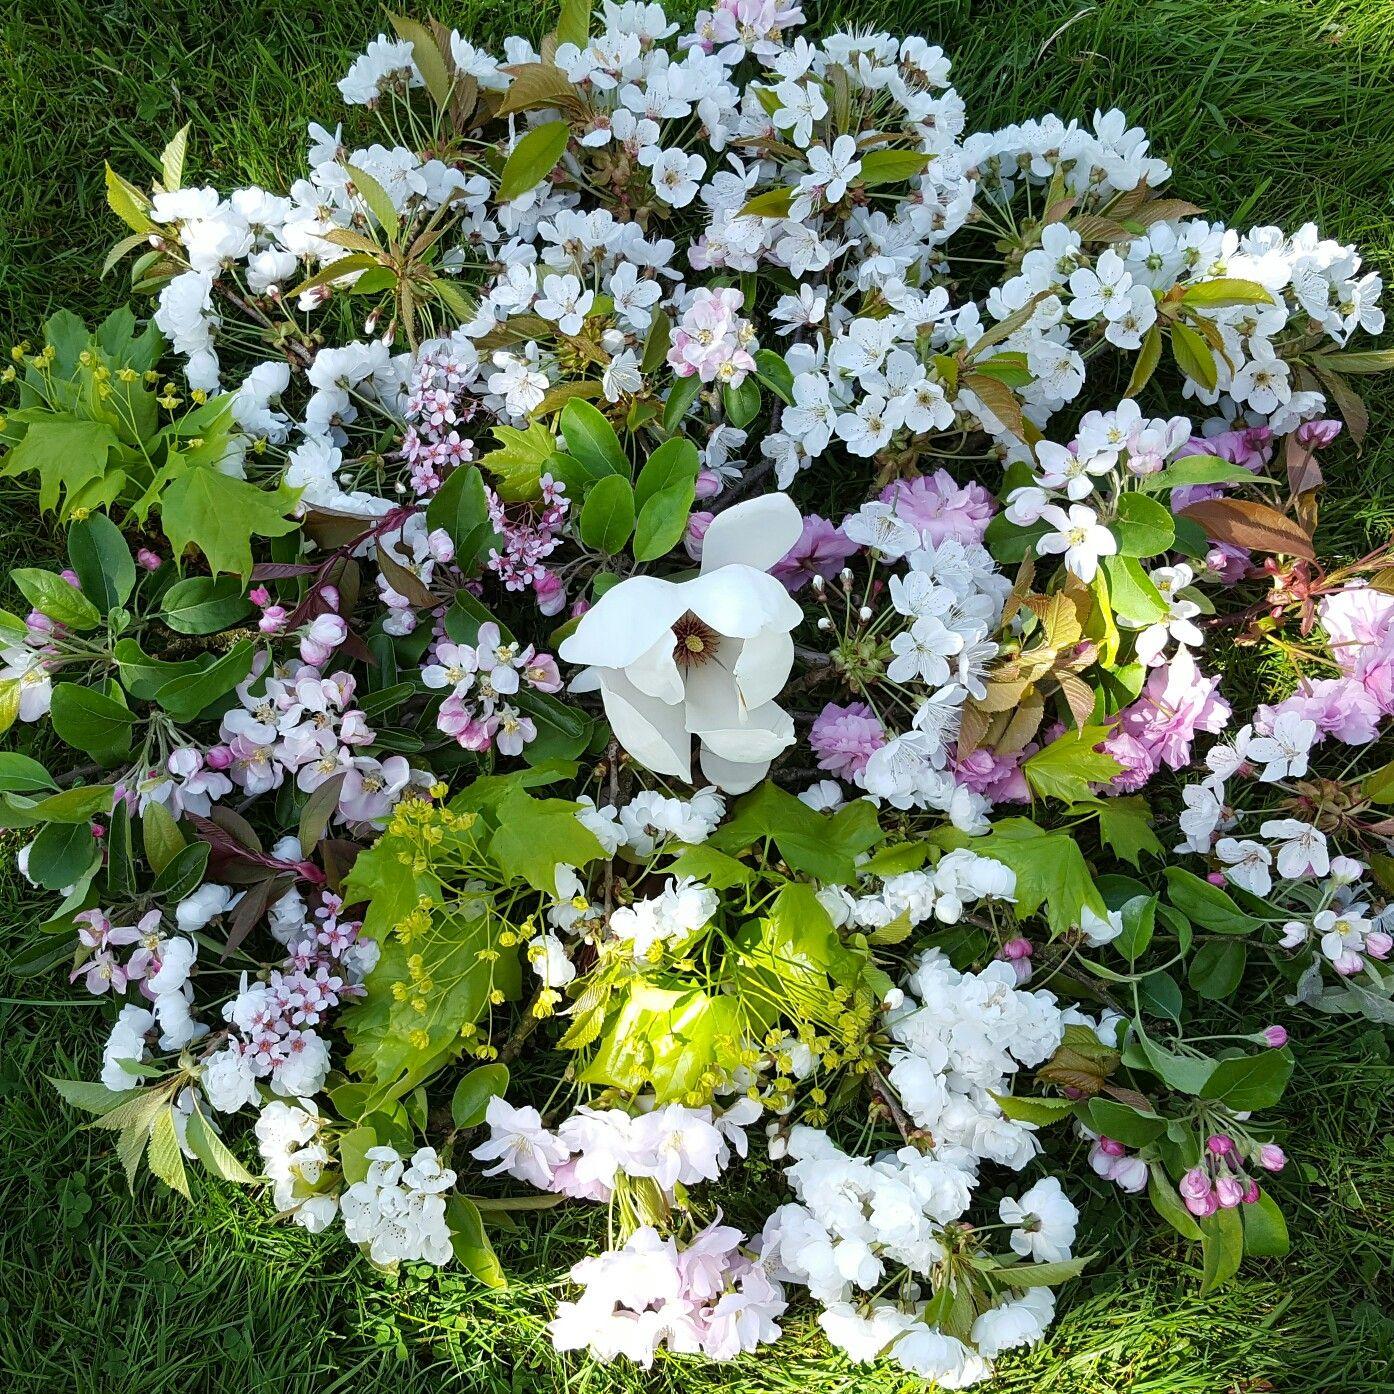 My blossom flower medicine wheel, celebrating the blossom season here at Orchard Oast.